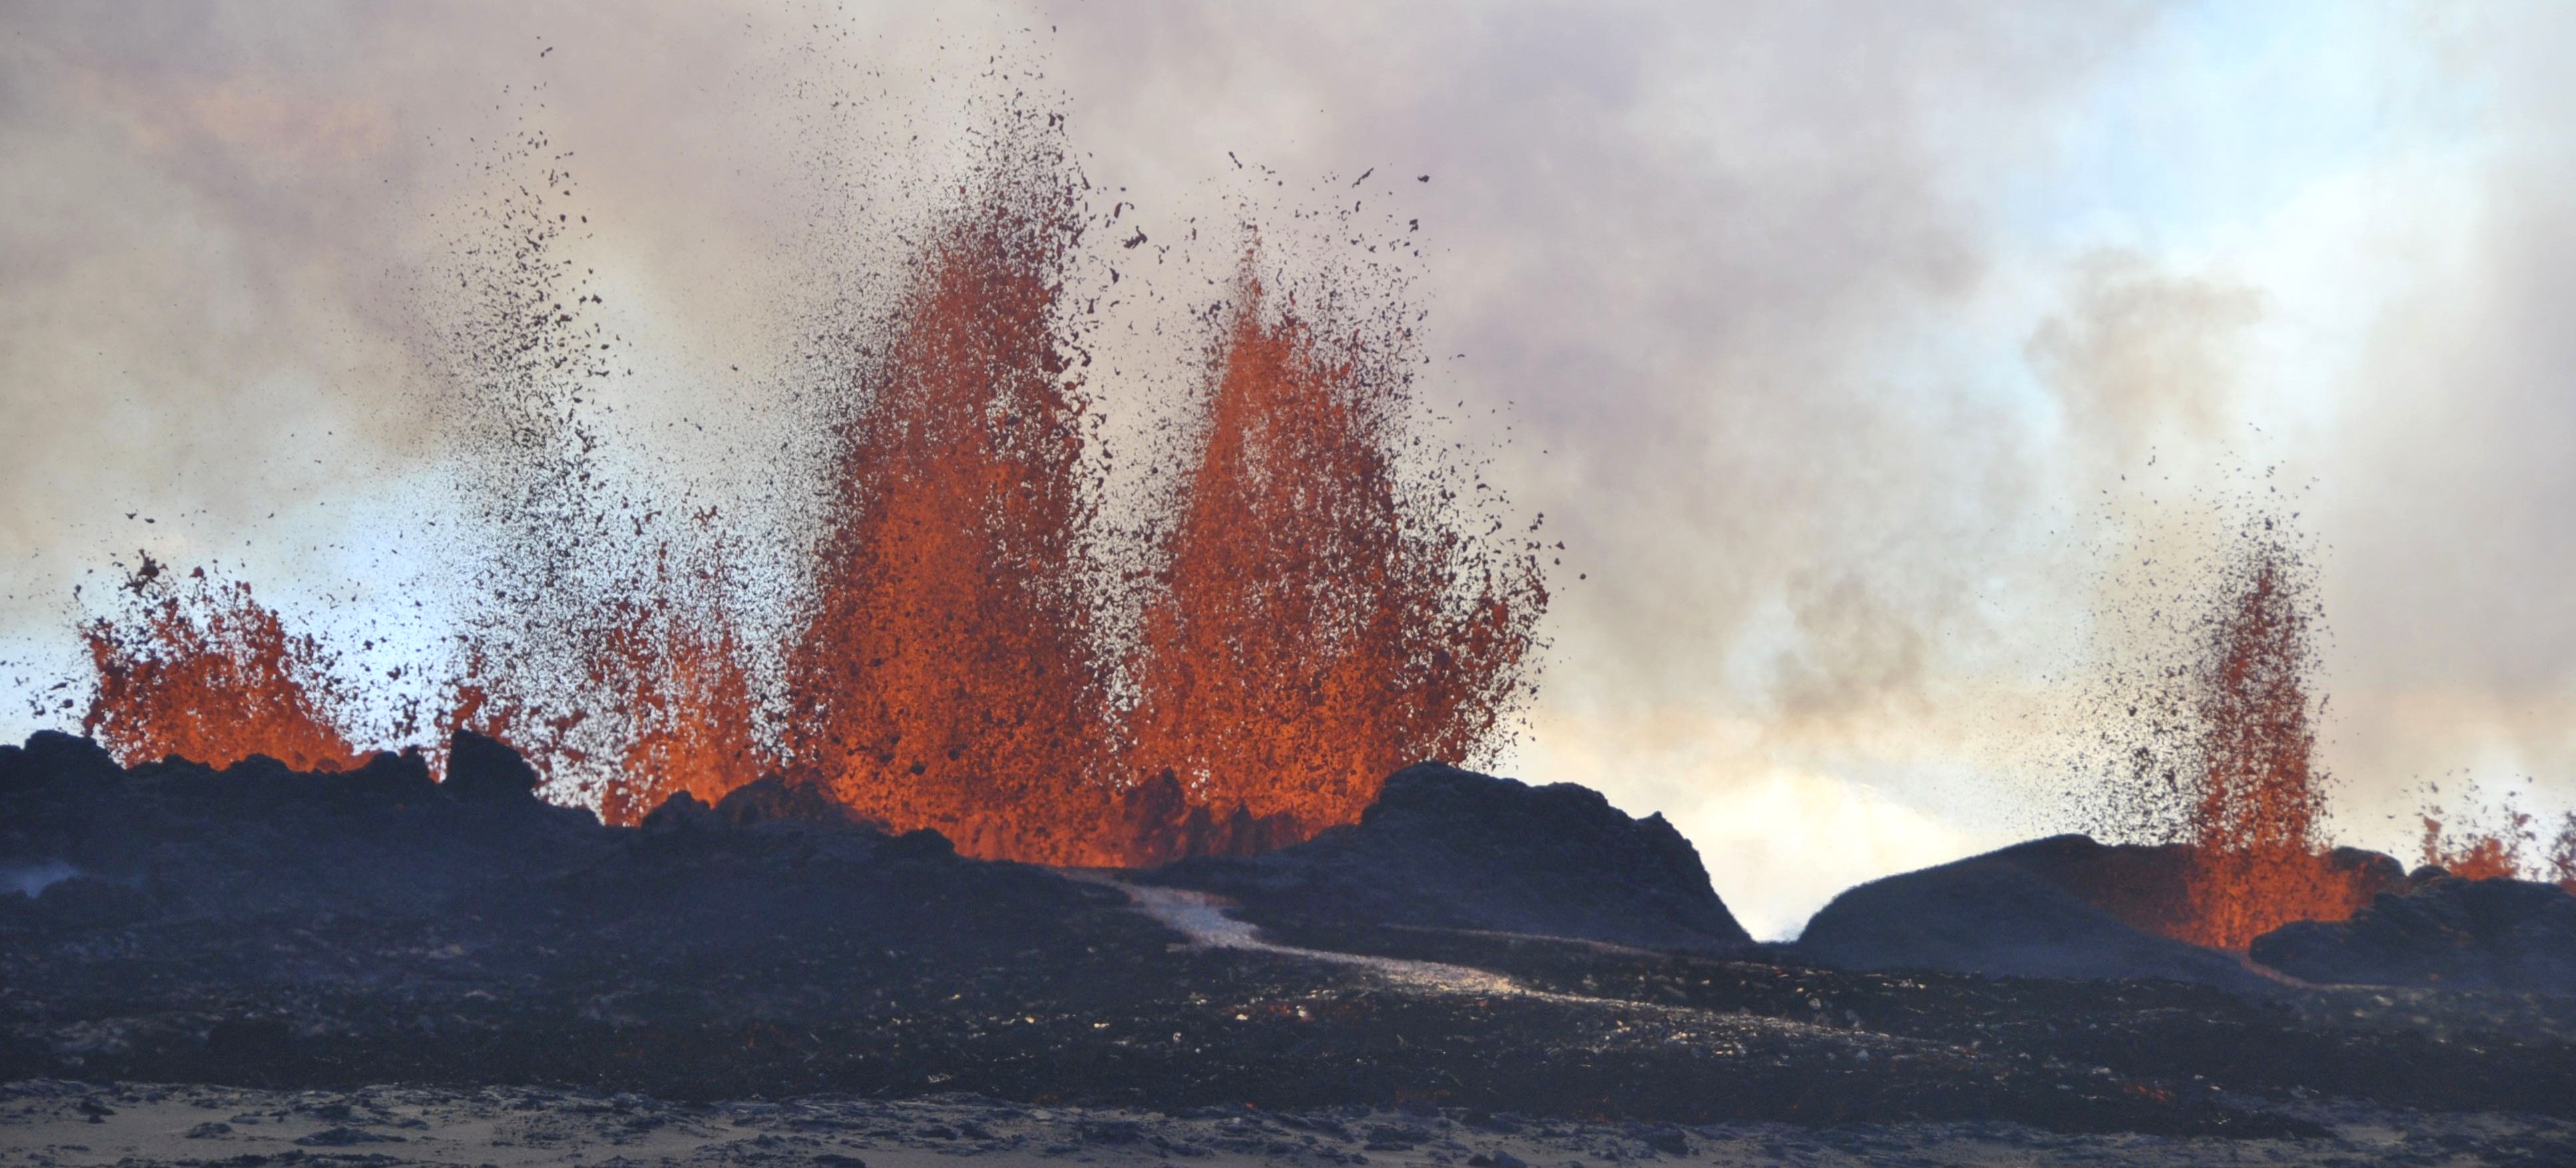 Chasing the volcano | University of Cambridge Measuring Instruments